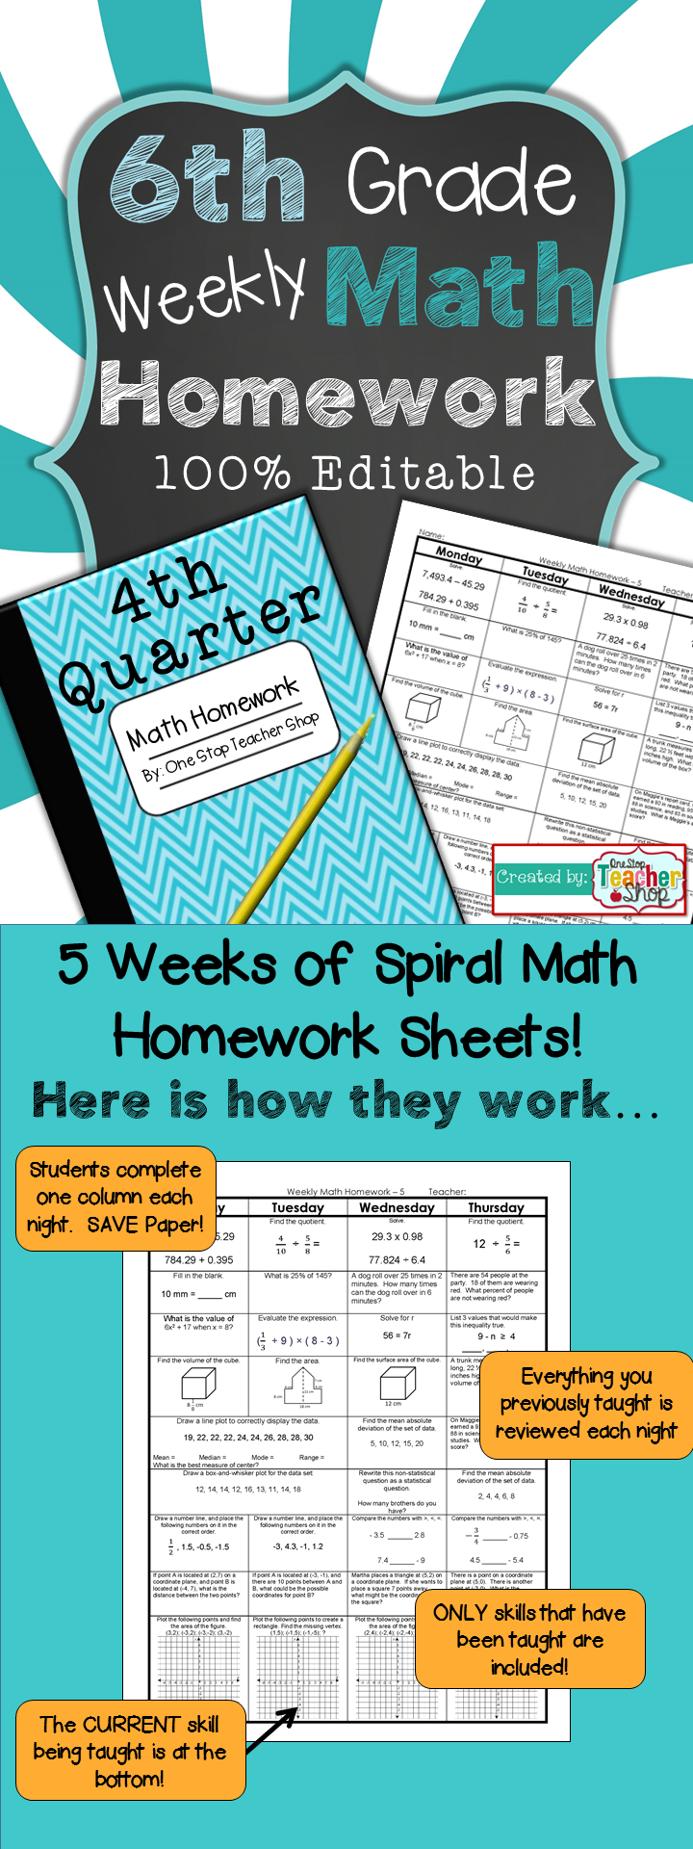 6th Grade Math Review | Homework or Warm Ups | 4th Quarter ...